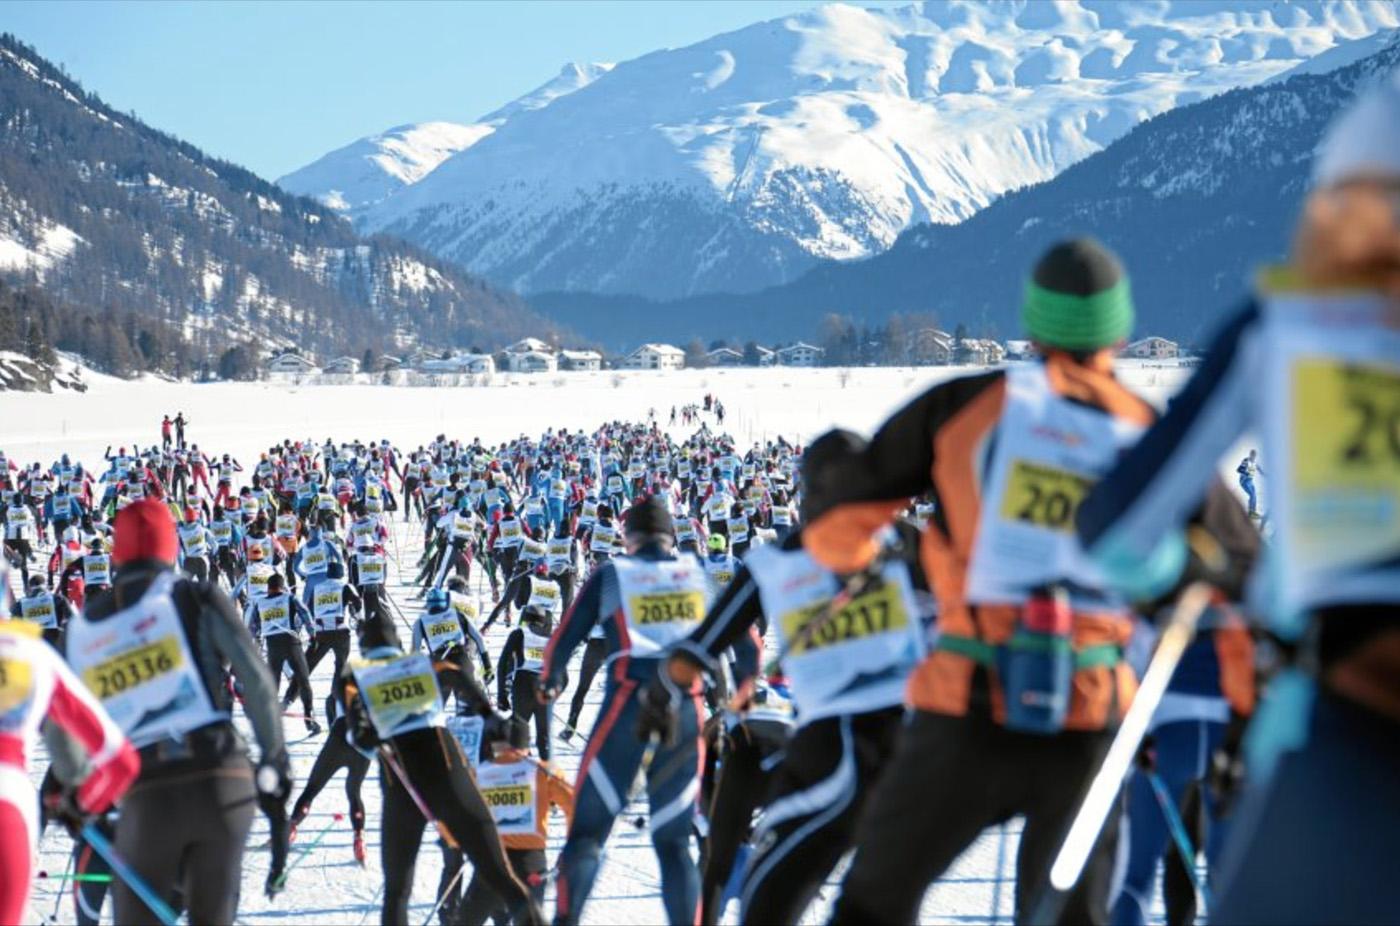 Marcialonga & Toblach-Cortina - Jan/Feb 2019